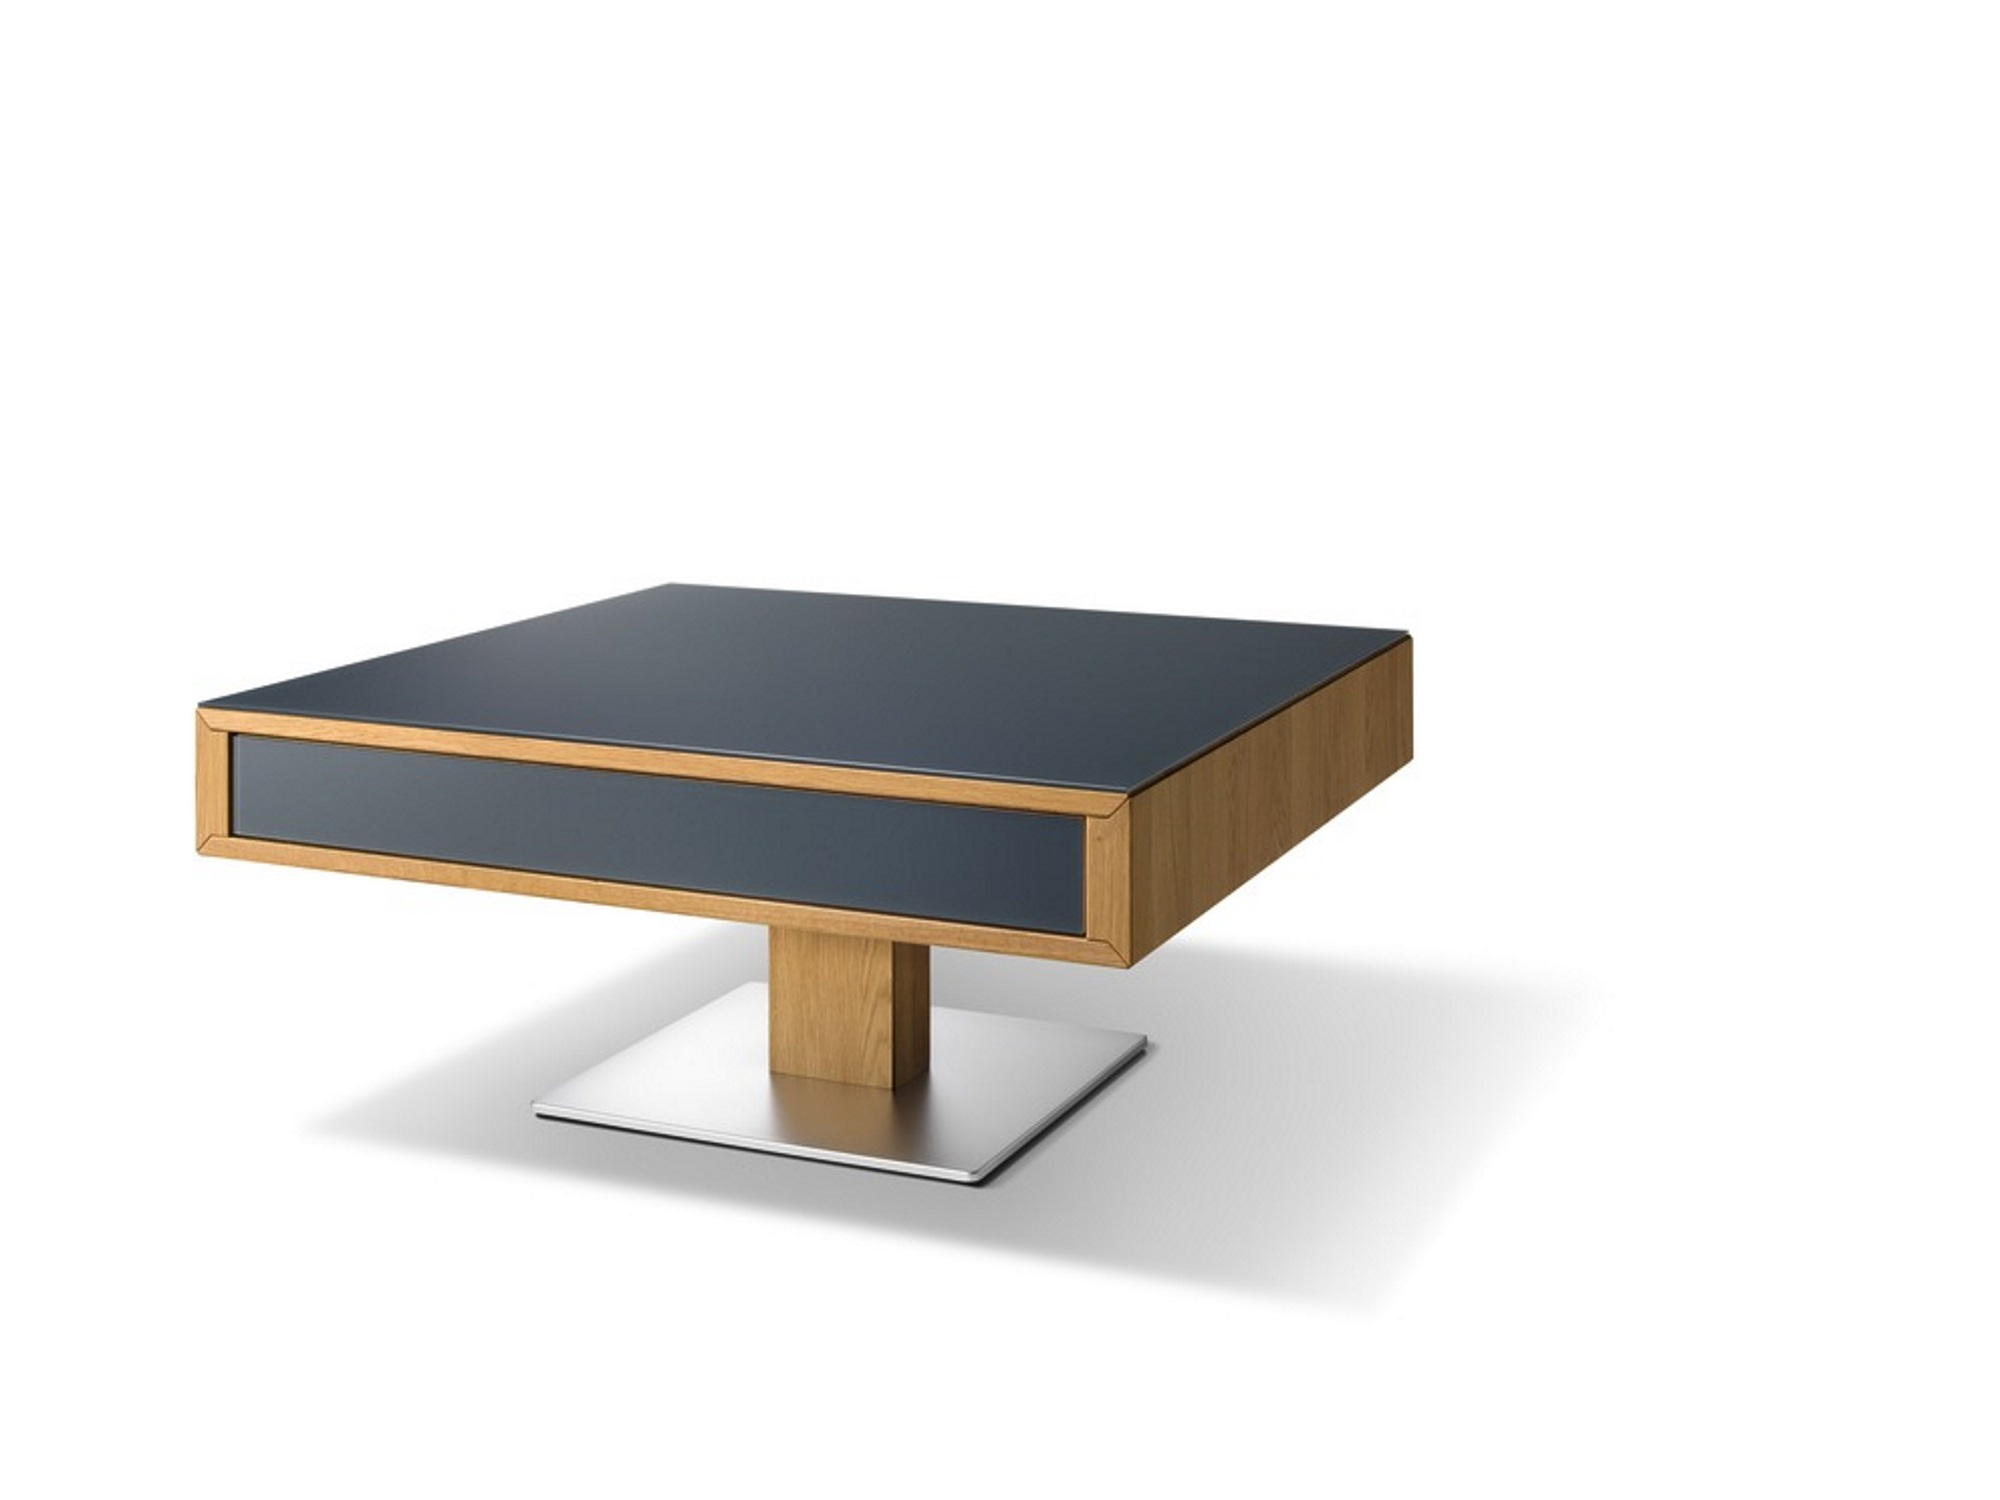 couchtisch lift biom bel bonn. Black Bedroom Furniture Sets. Home Design Ideas